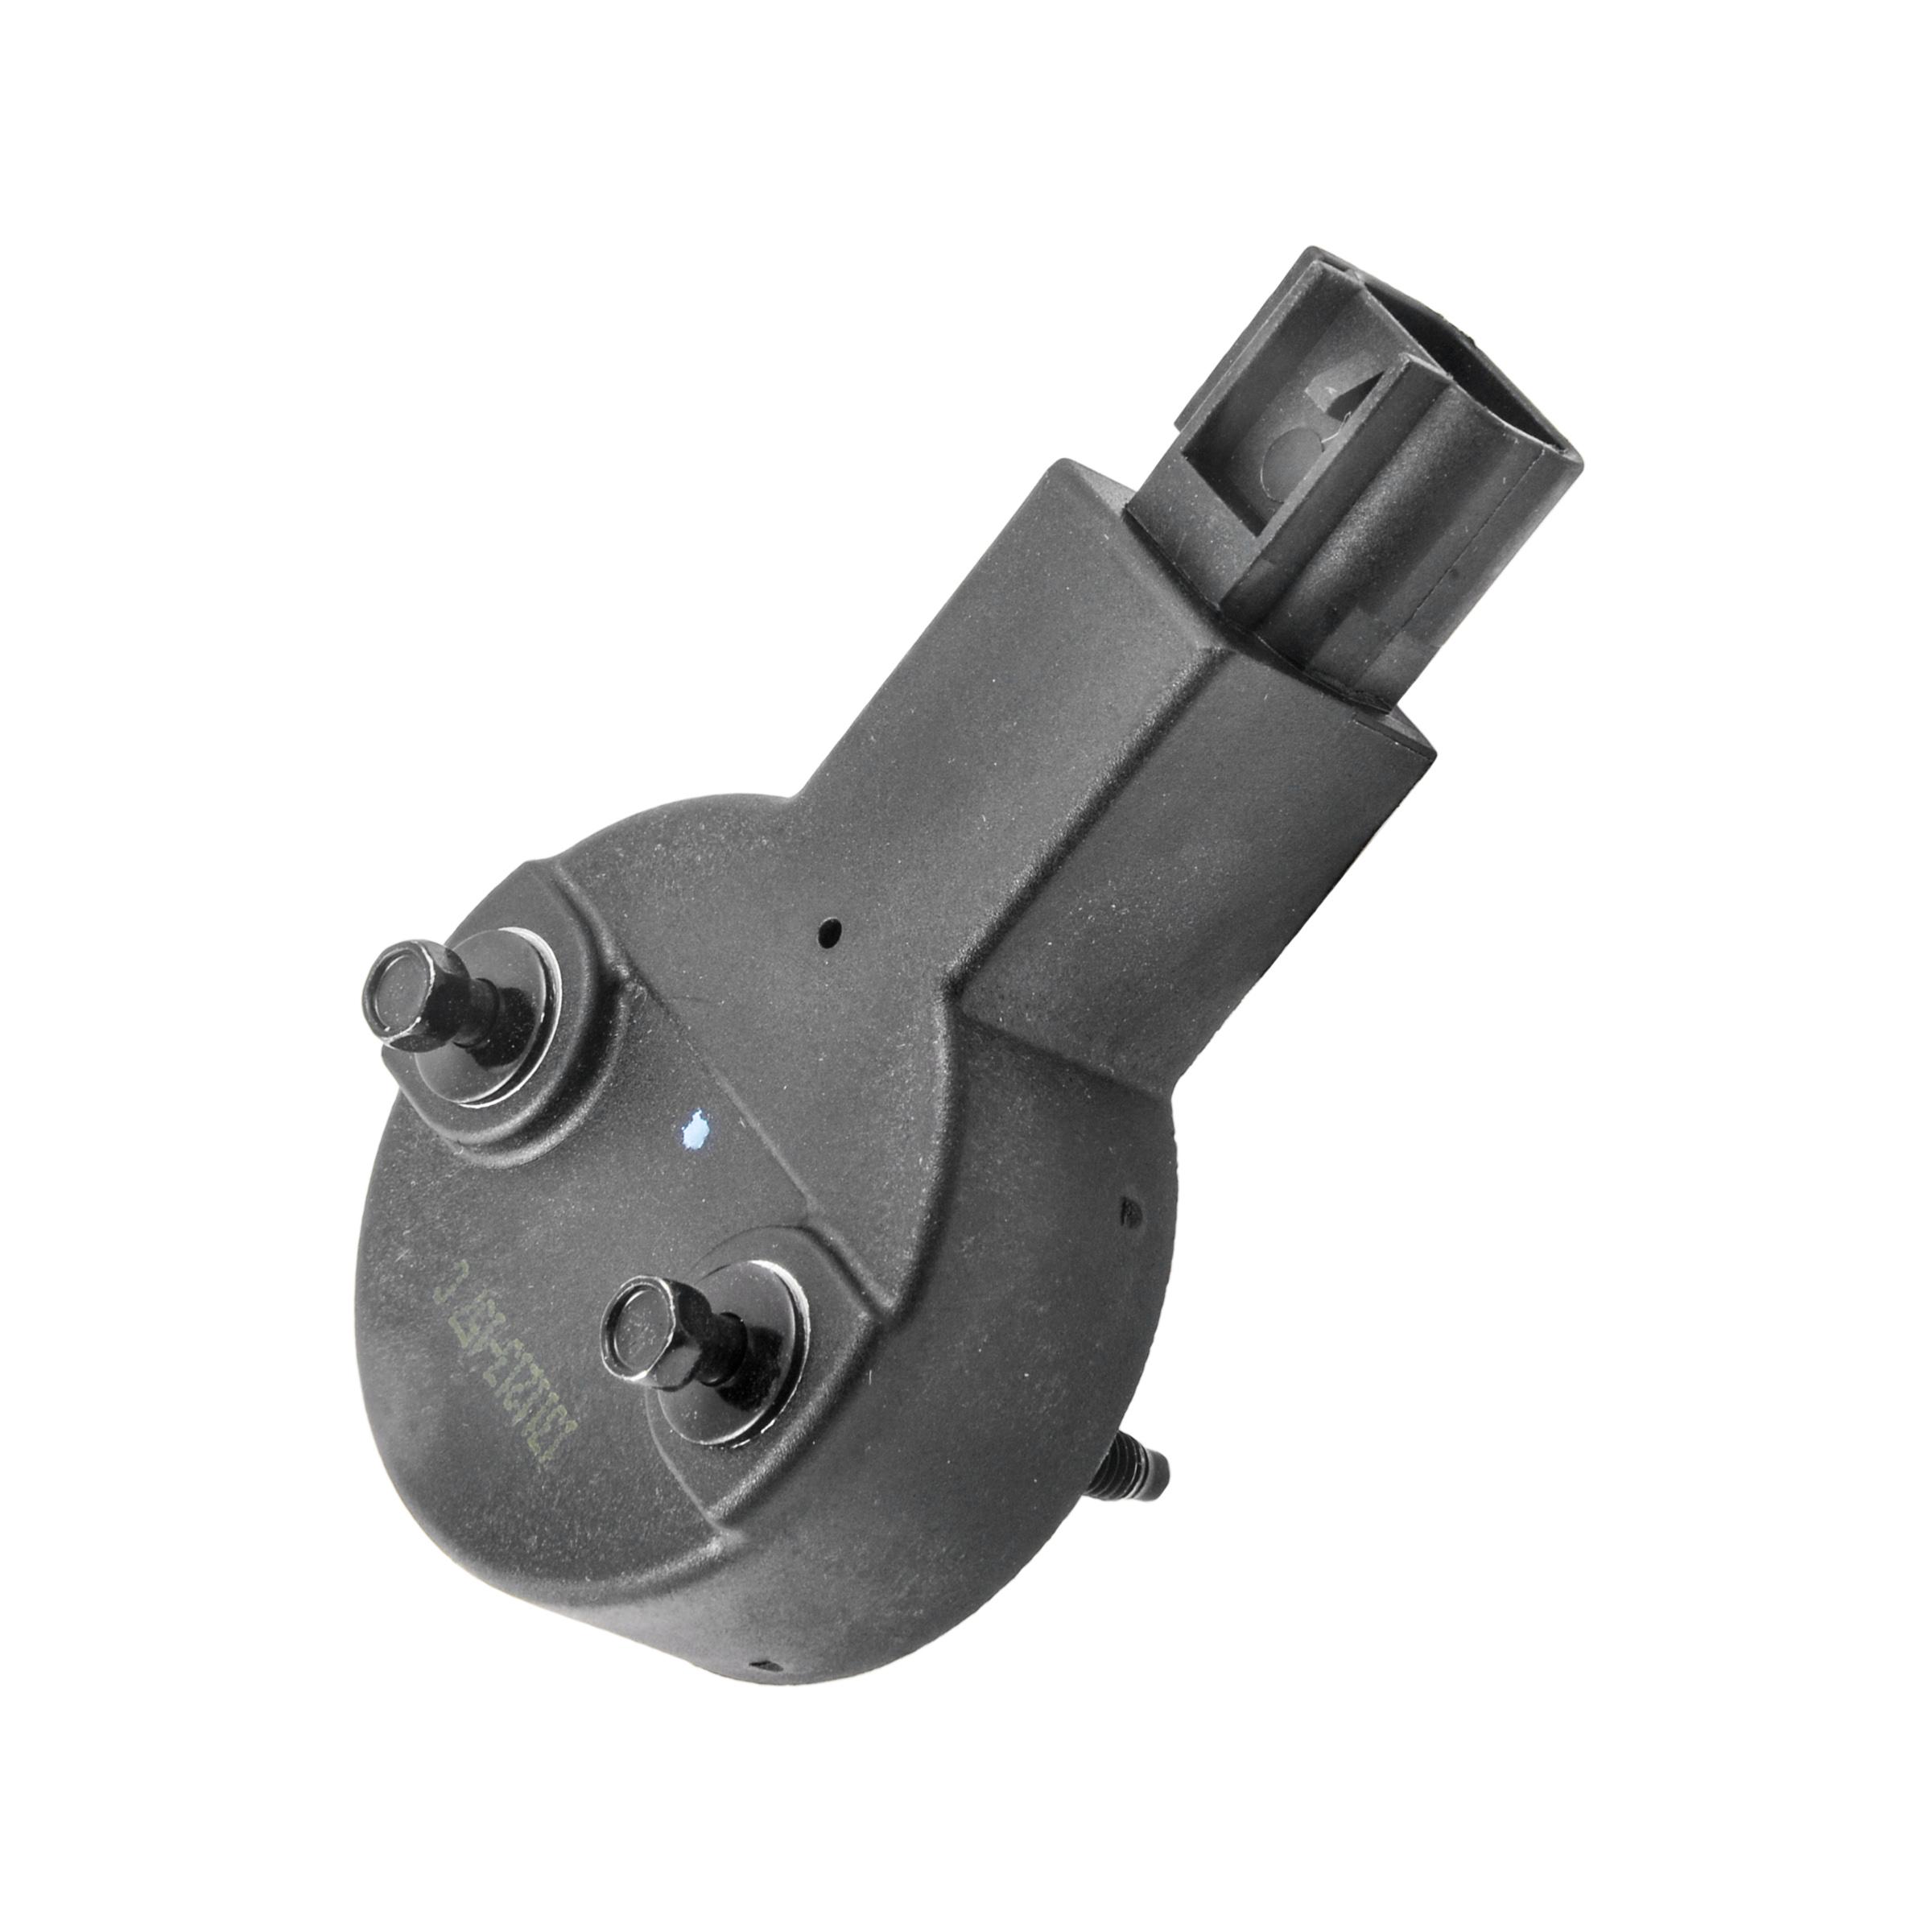 New Herko Camshaft Position Sensor CMP3014 For Ford